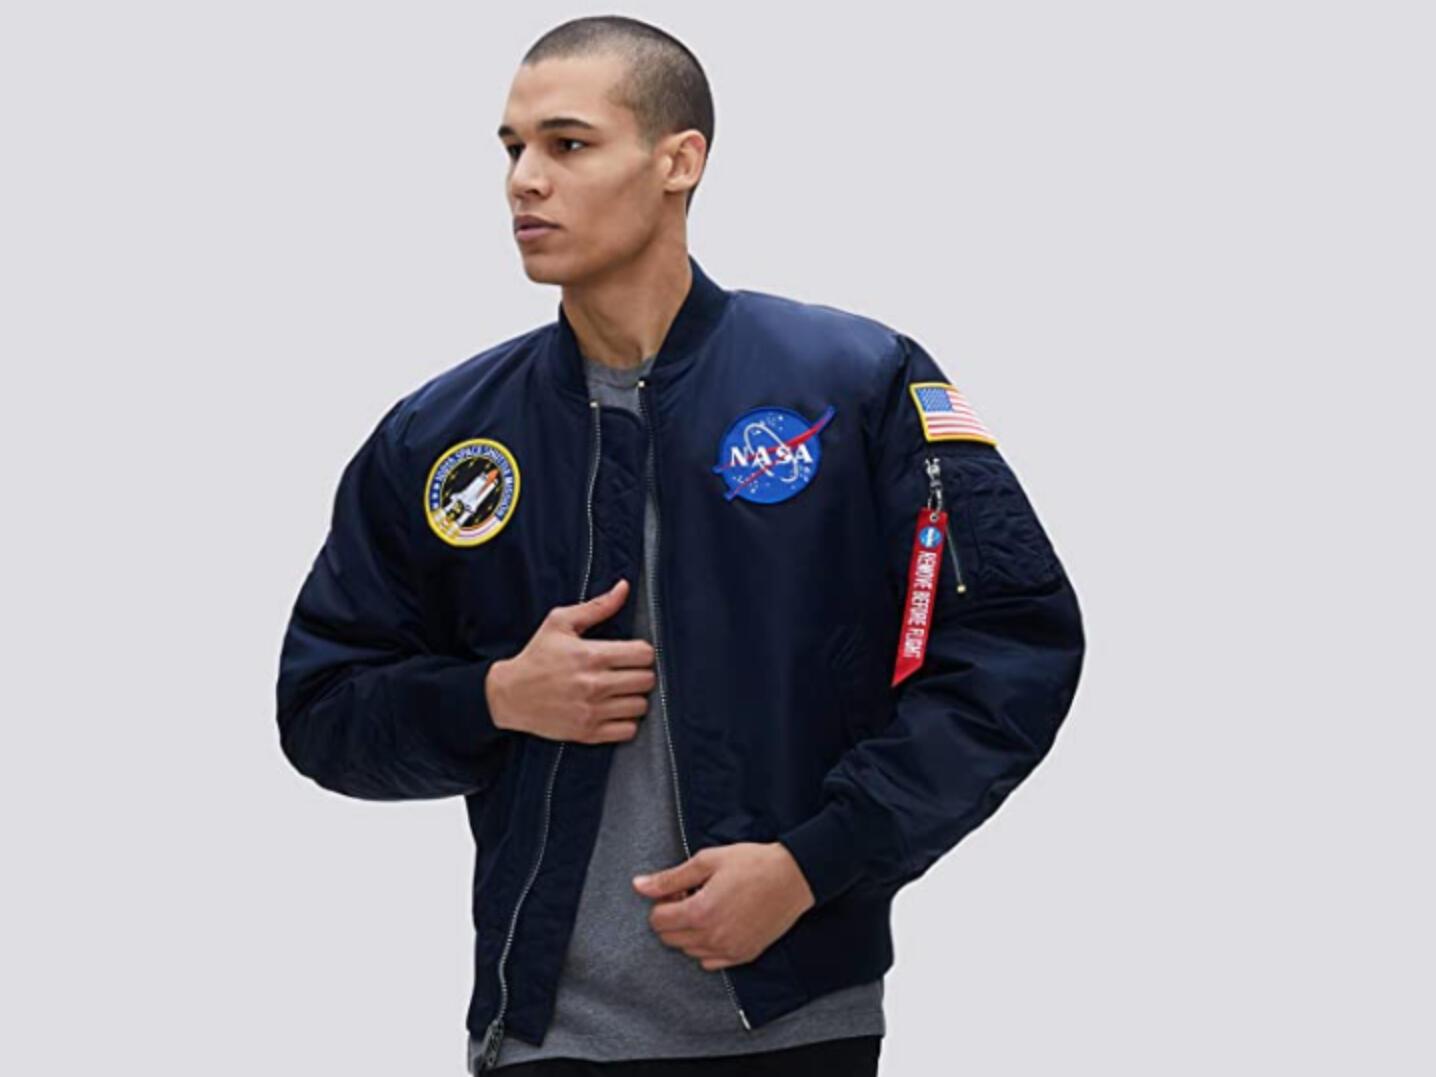 nasa-jacket.jpg